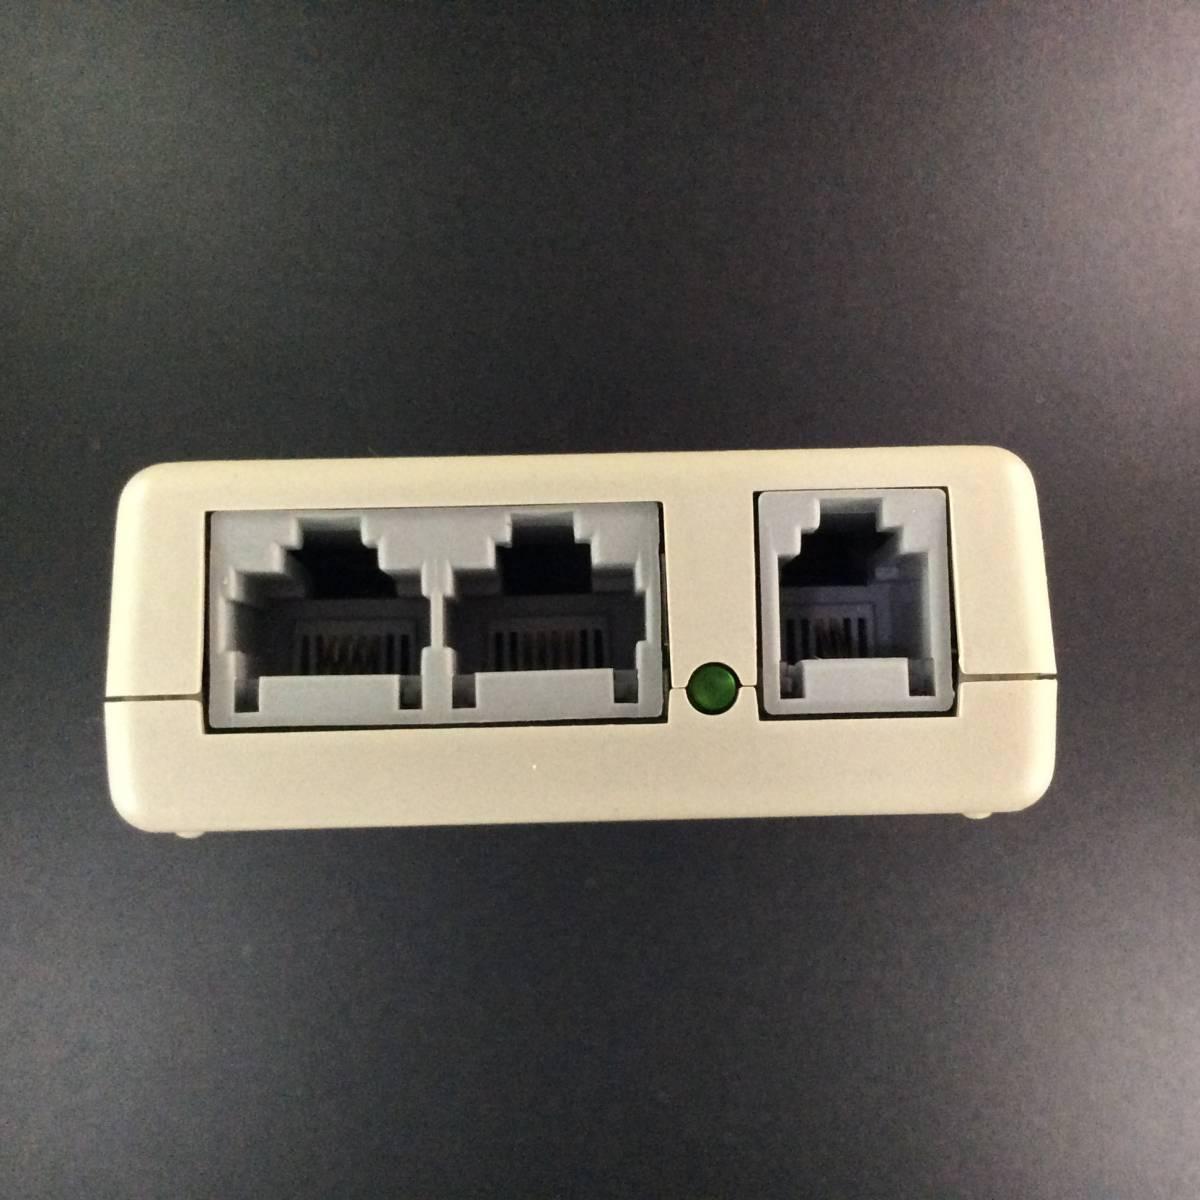 ★☆★ NTT 西日本 SL-144K F DSU-E〈R〉★☆★ 一度使用 美品 ★☆★ISDN DSU I-DSU64VB デジタル回線接続装置 _画像7